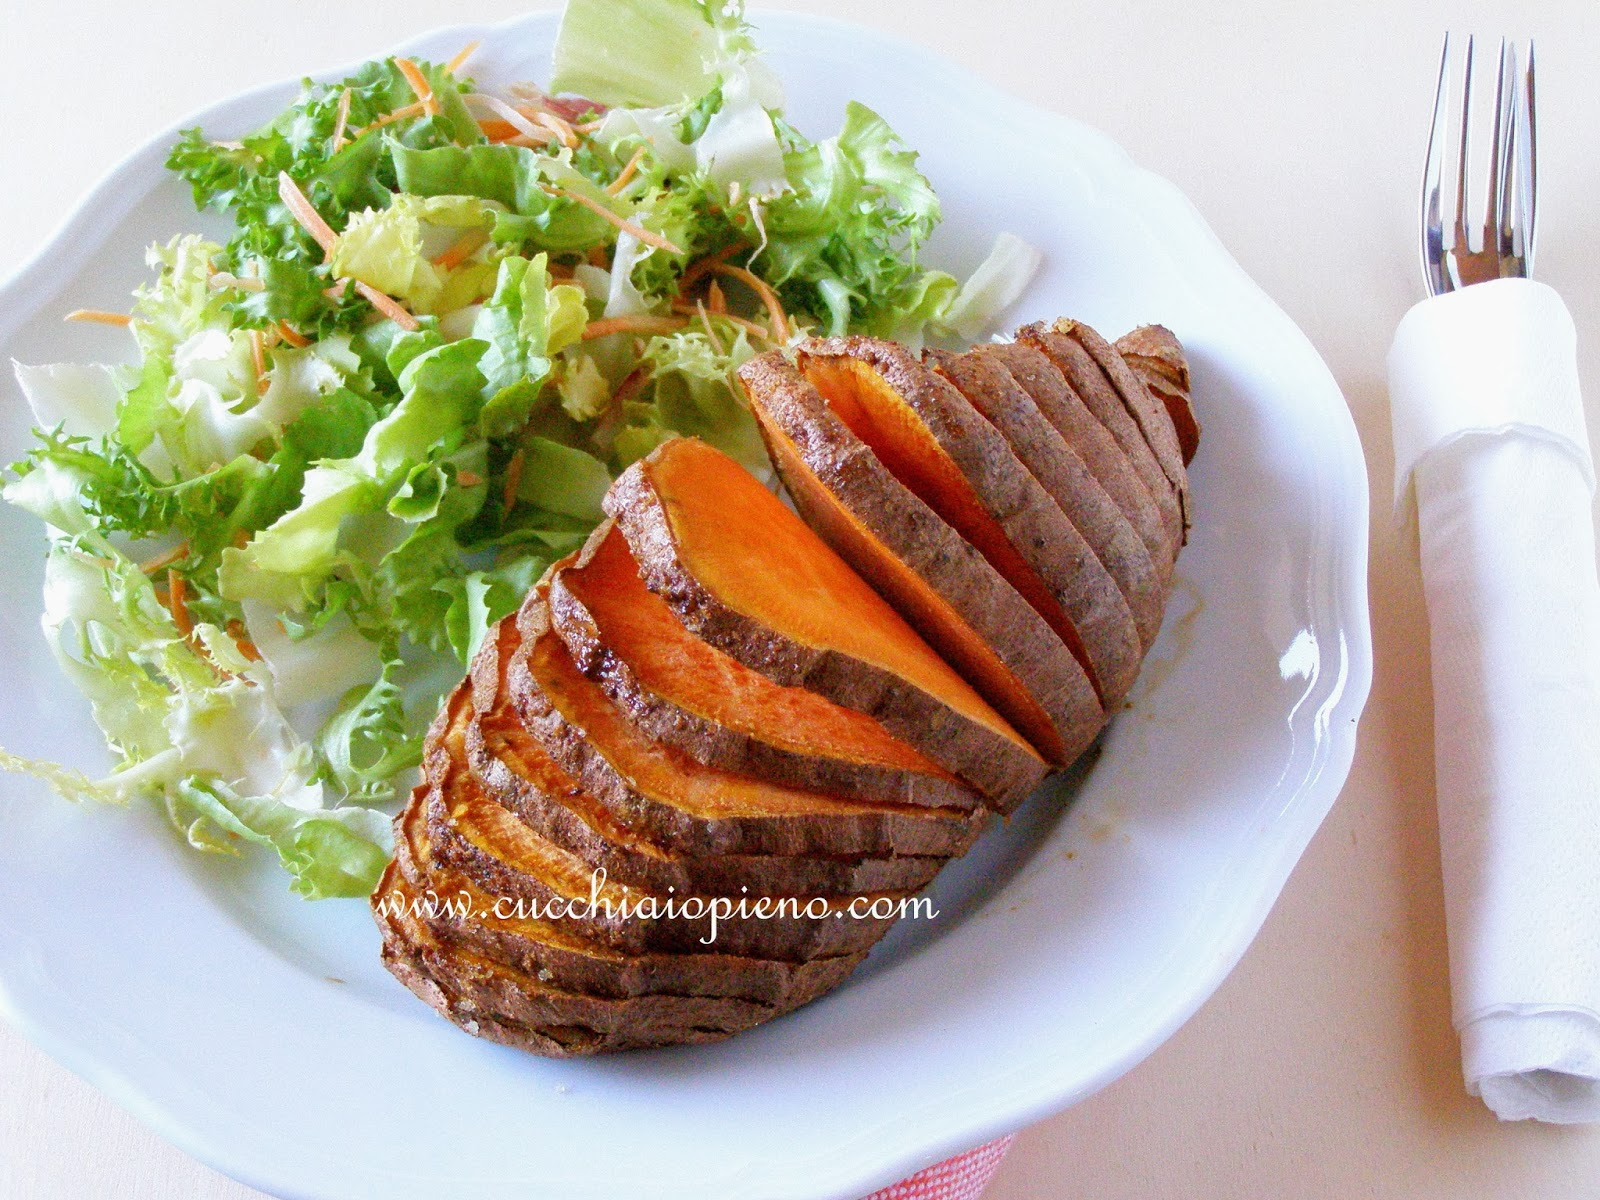 batata-doce assada deliciosa